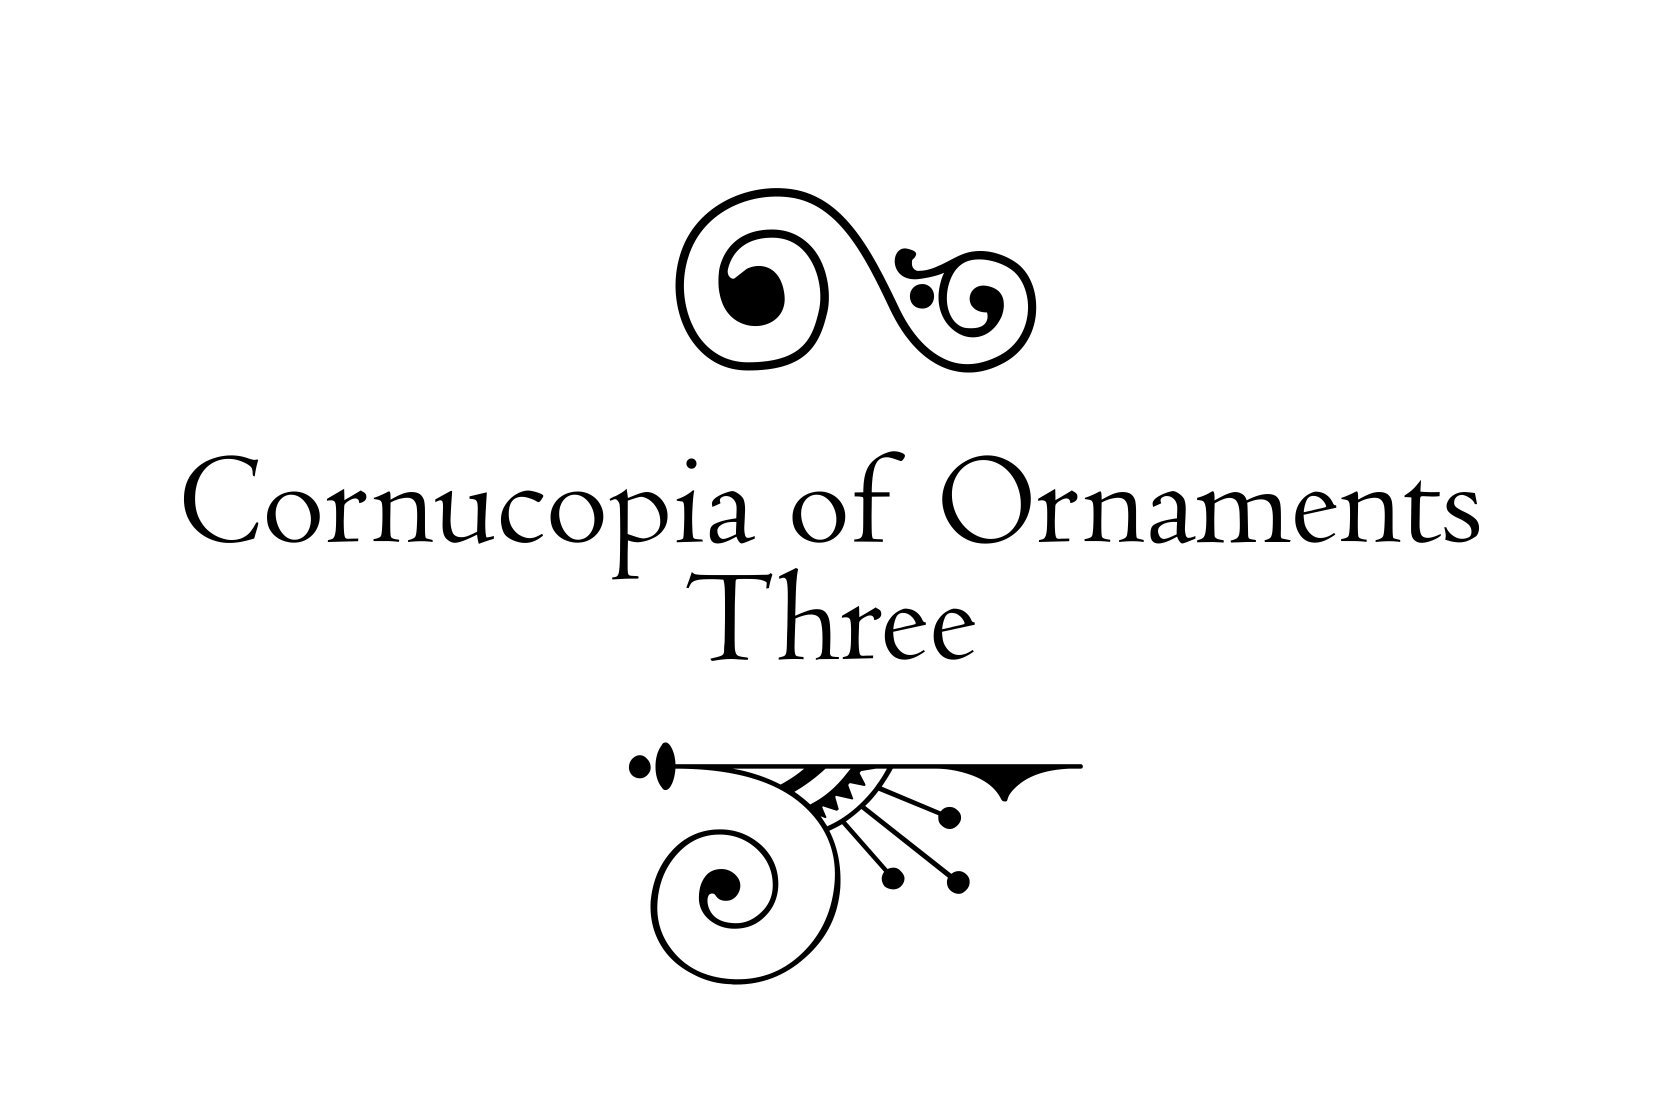 Cornucopia of Ornaments Three example image 4